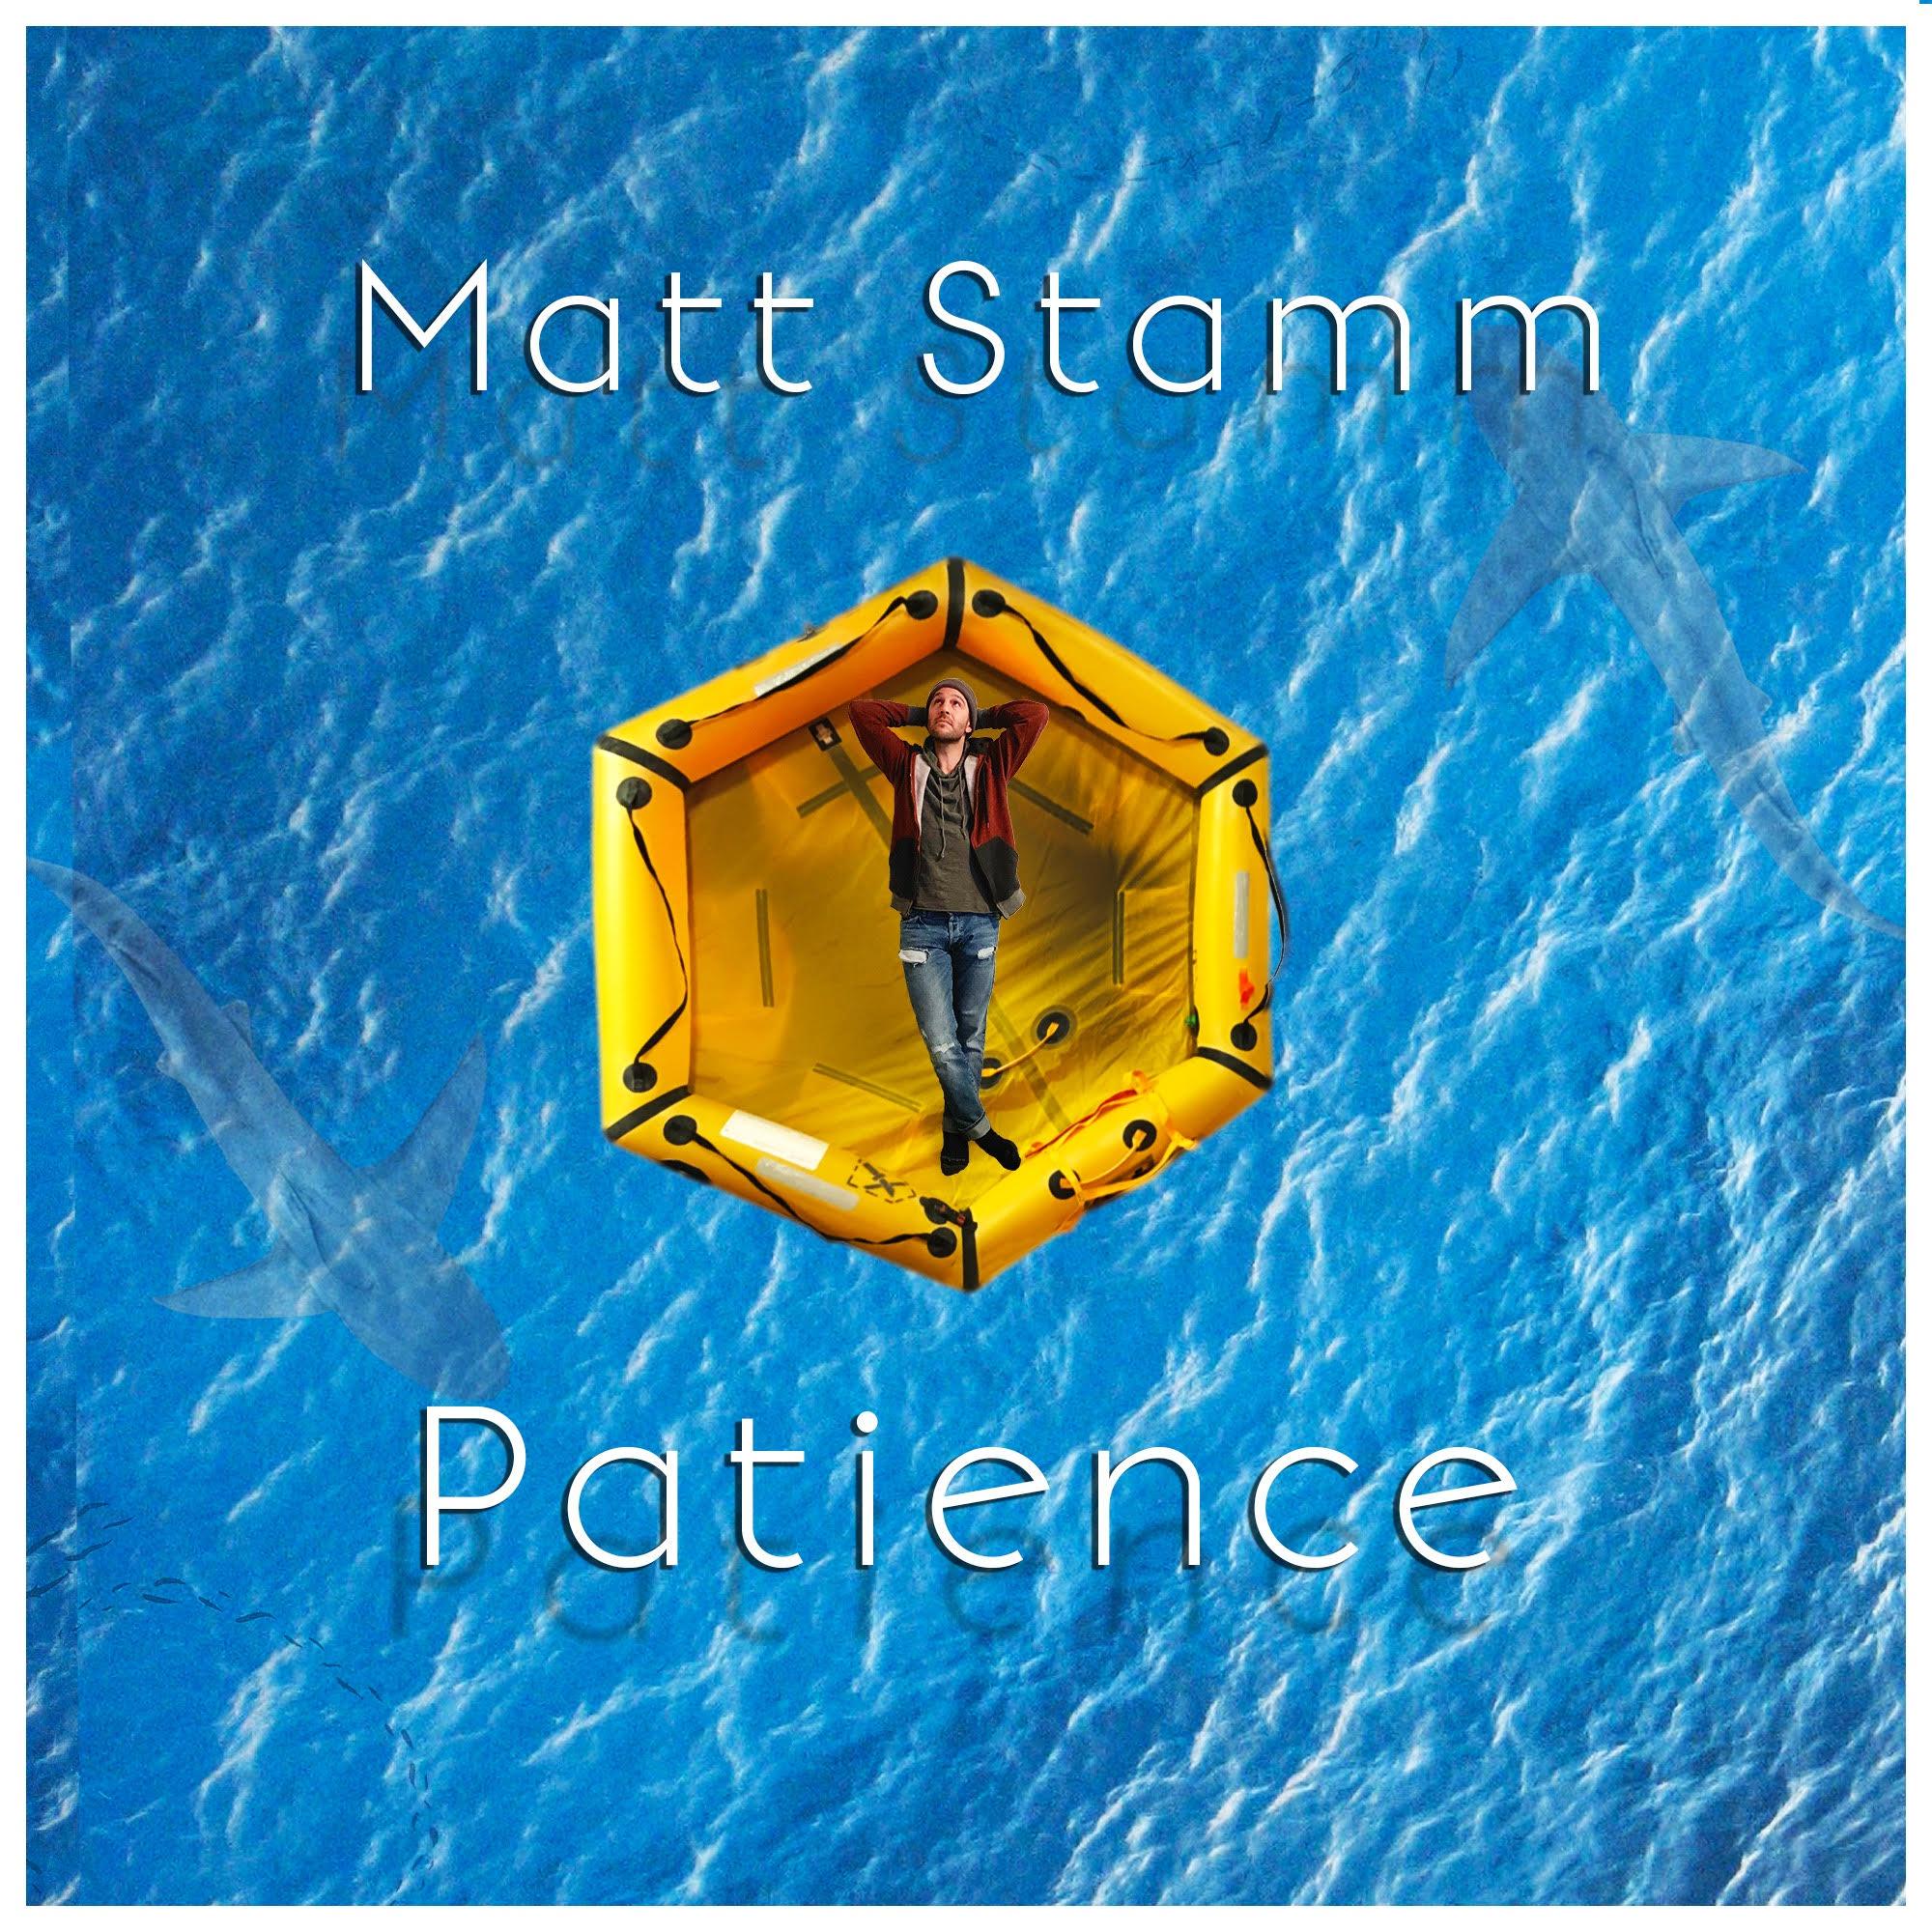 Patience - Matt Stamm